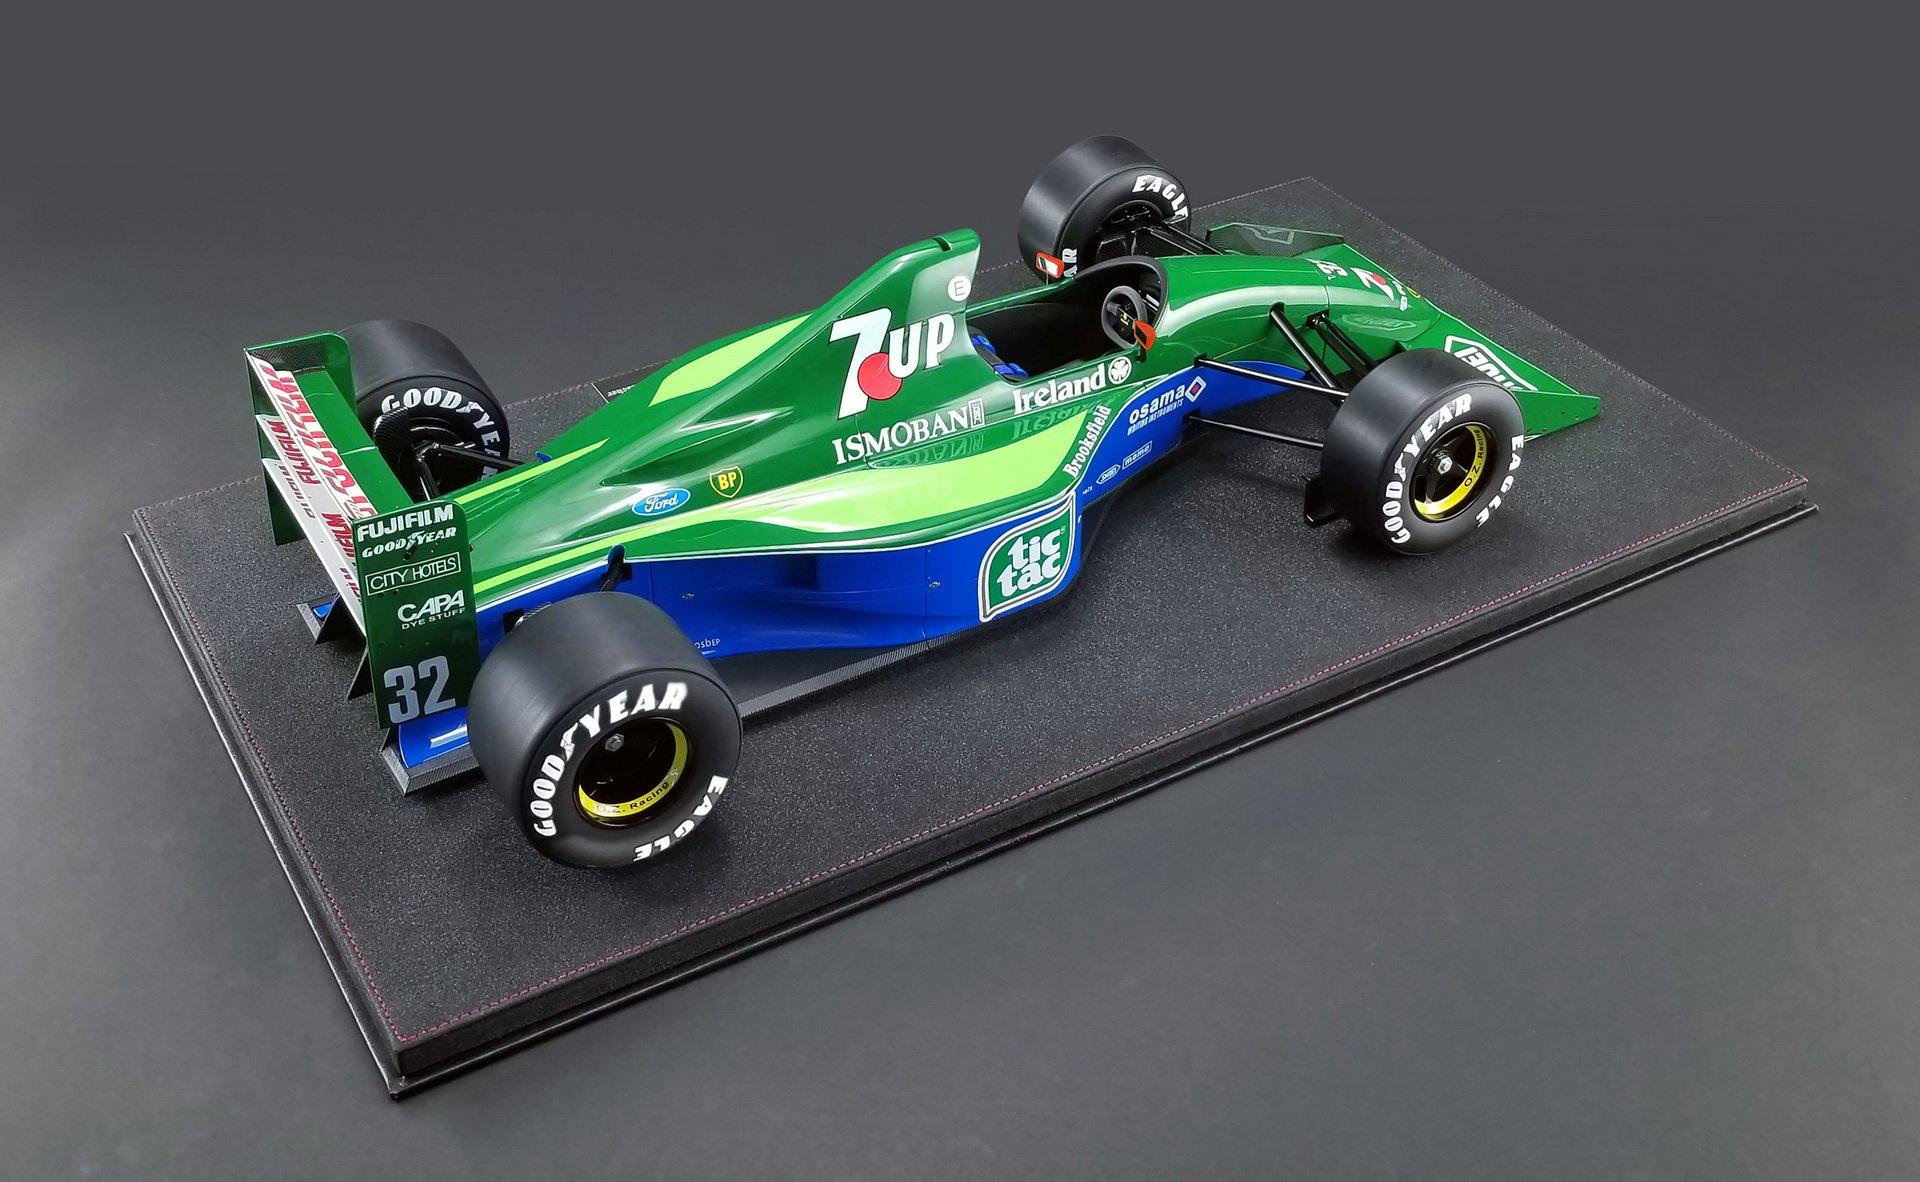 1991_Jordan_F1_car_Schumacher_scale_0001